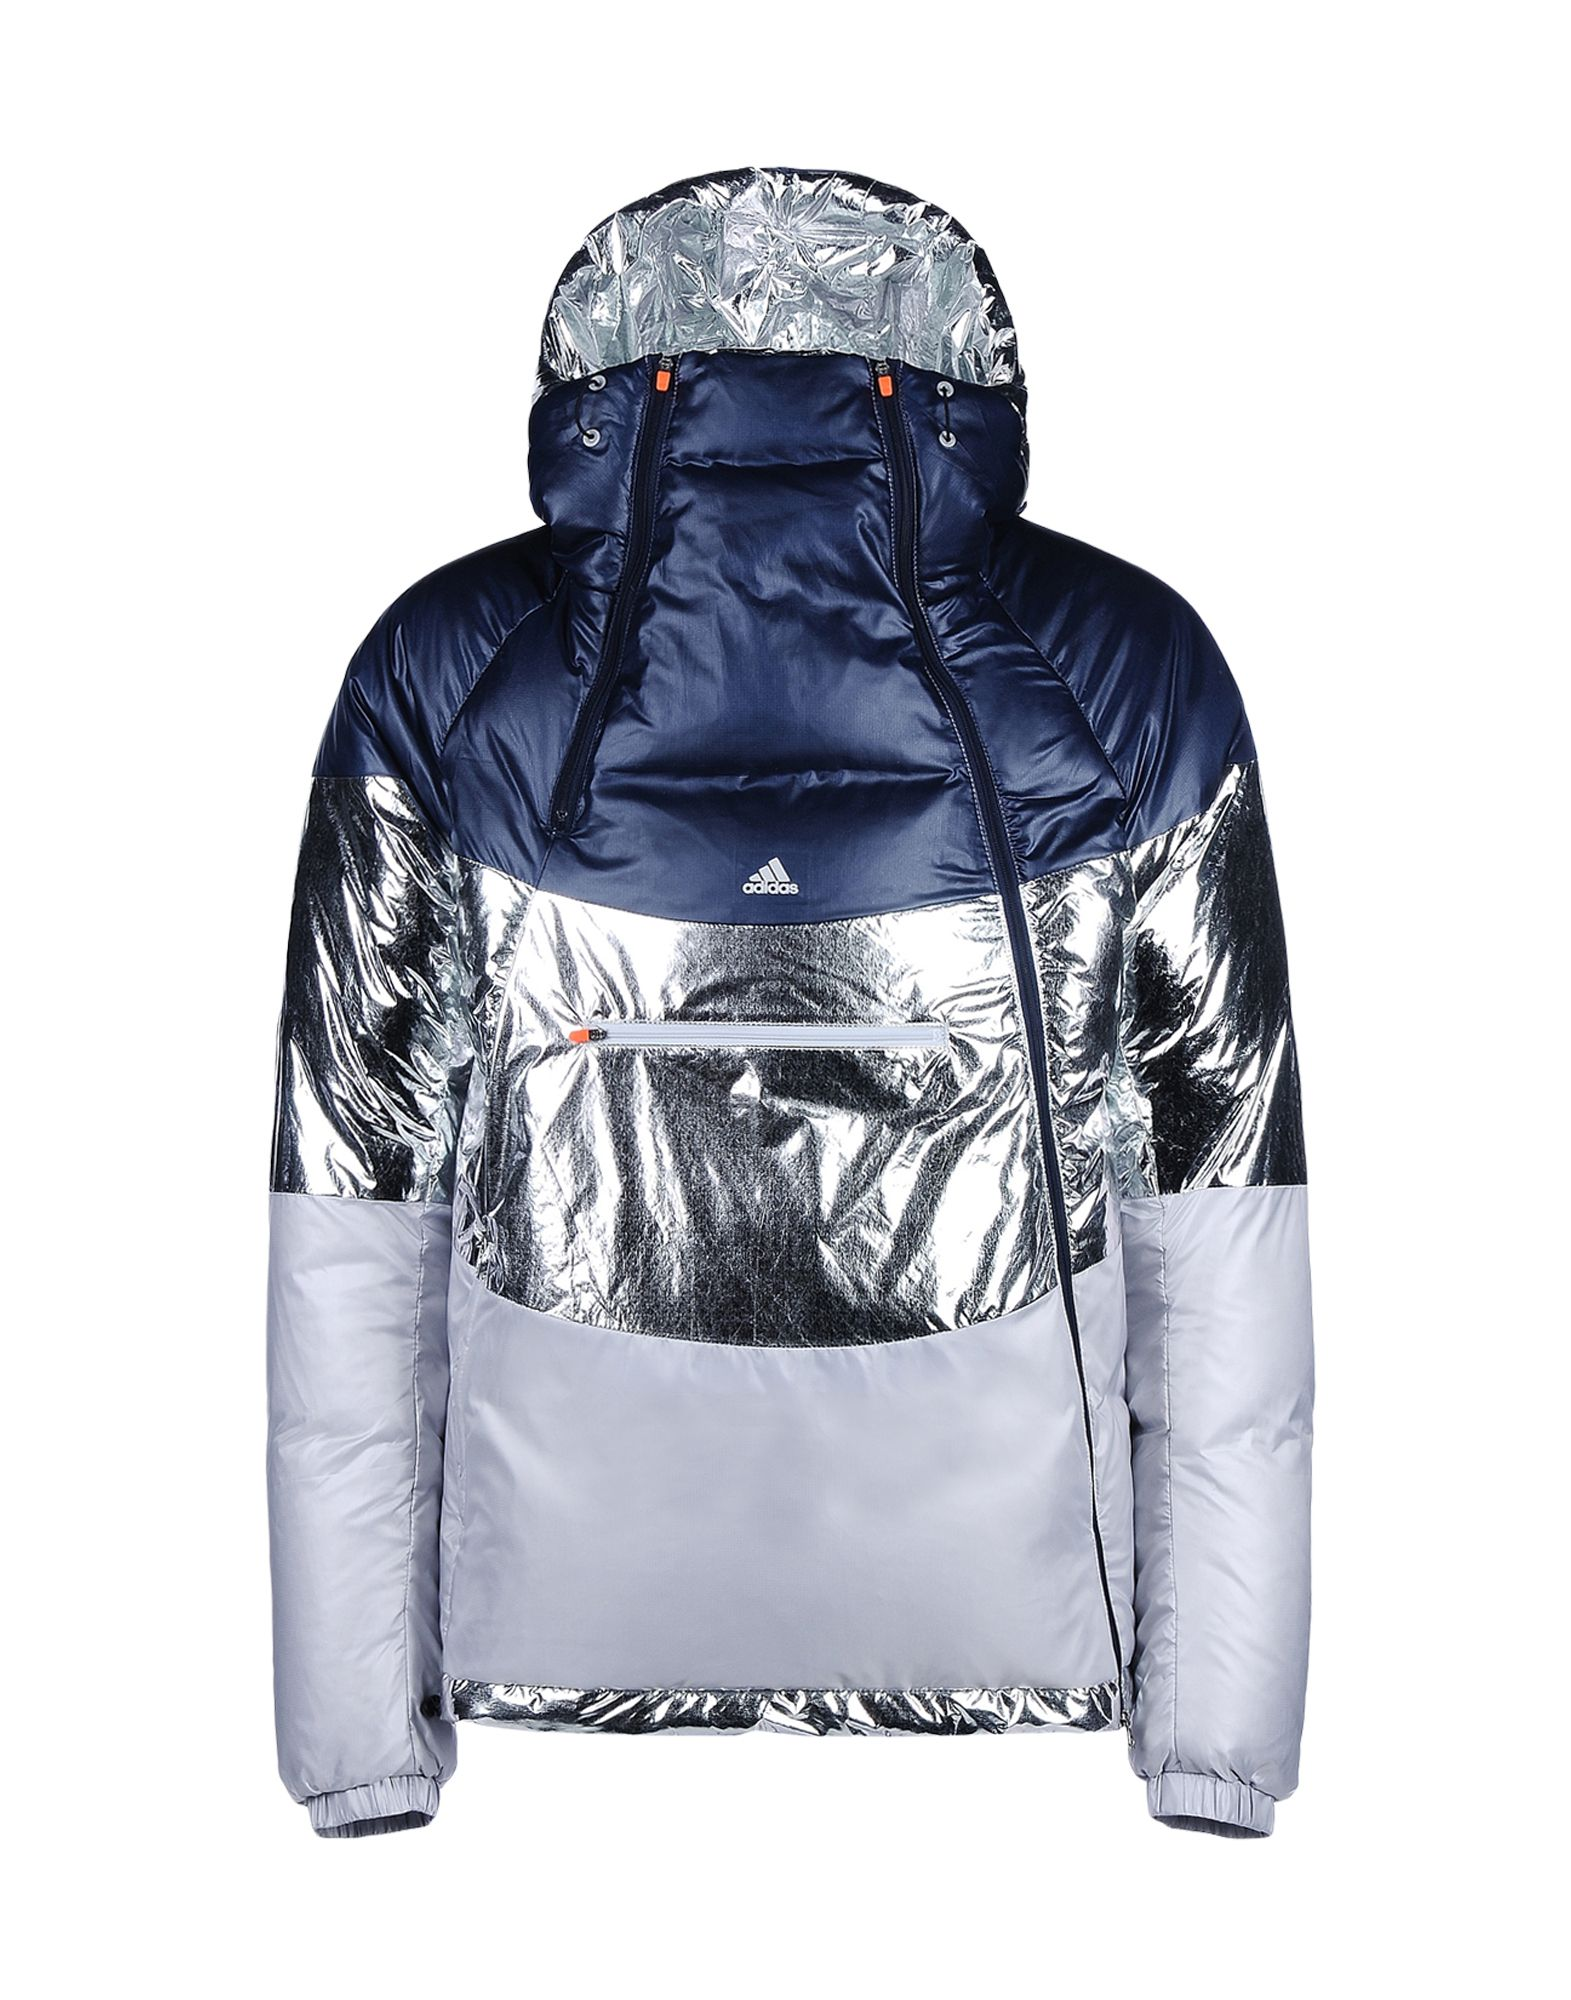 Wear Resistance Original Cheap Price COATS & JACKETS - Down jackets adidas Cheap Sale 6pCg4c0XQr